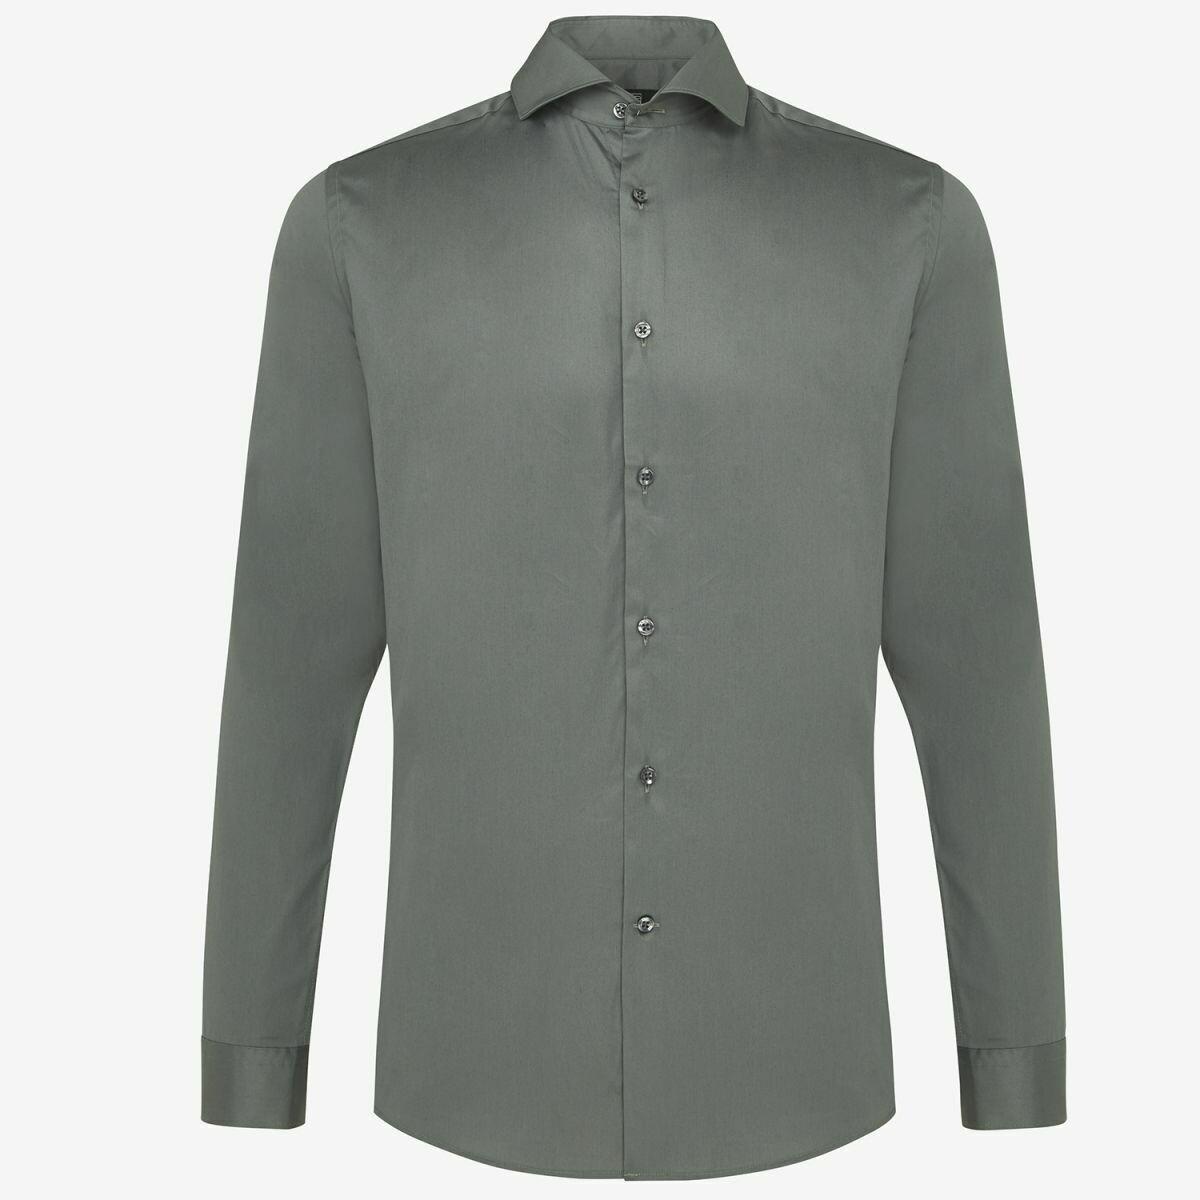 Genti | Skin Fit Overhemd | Blue Green